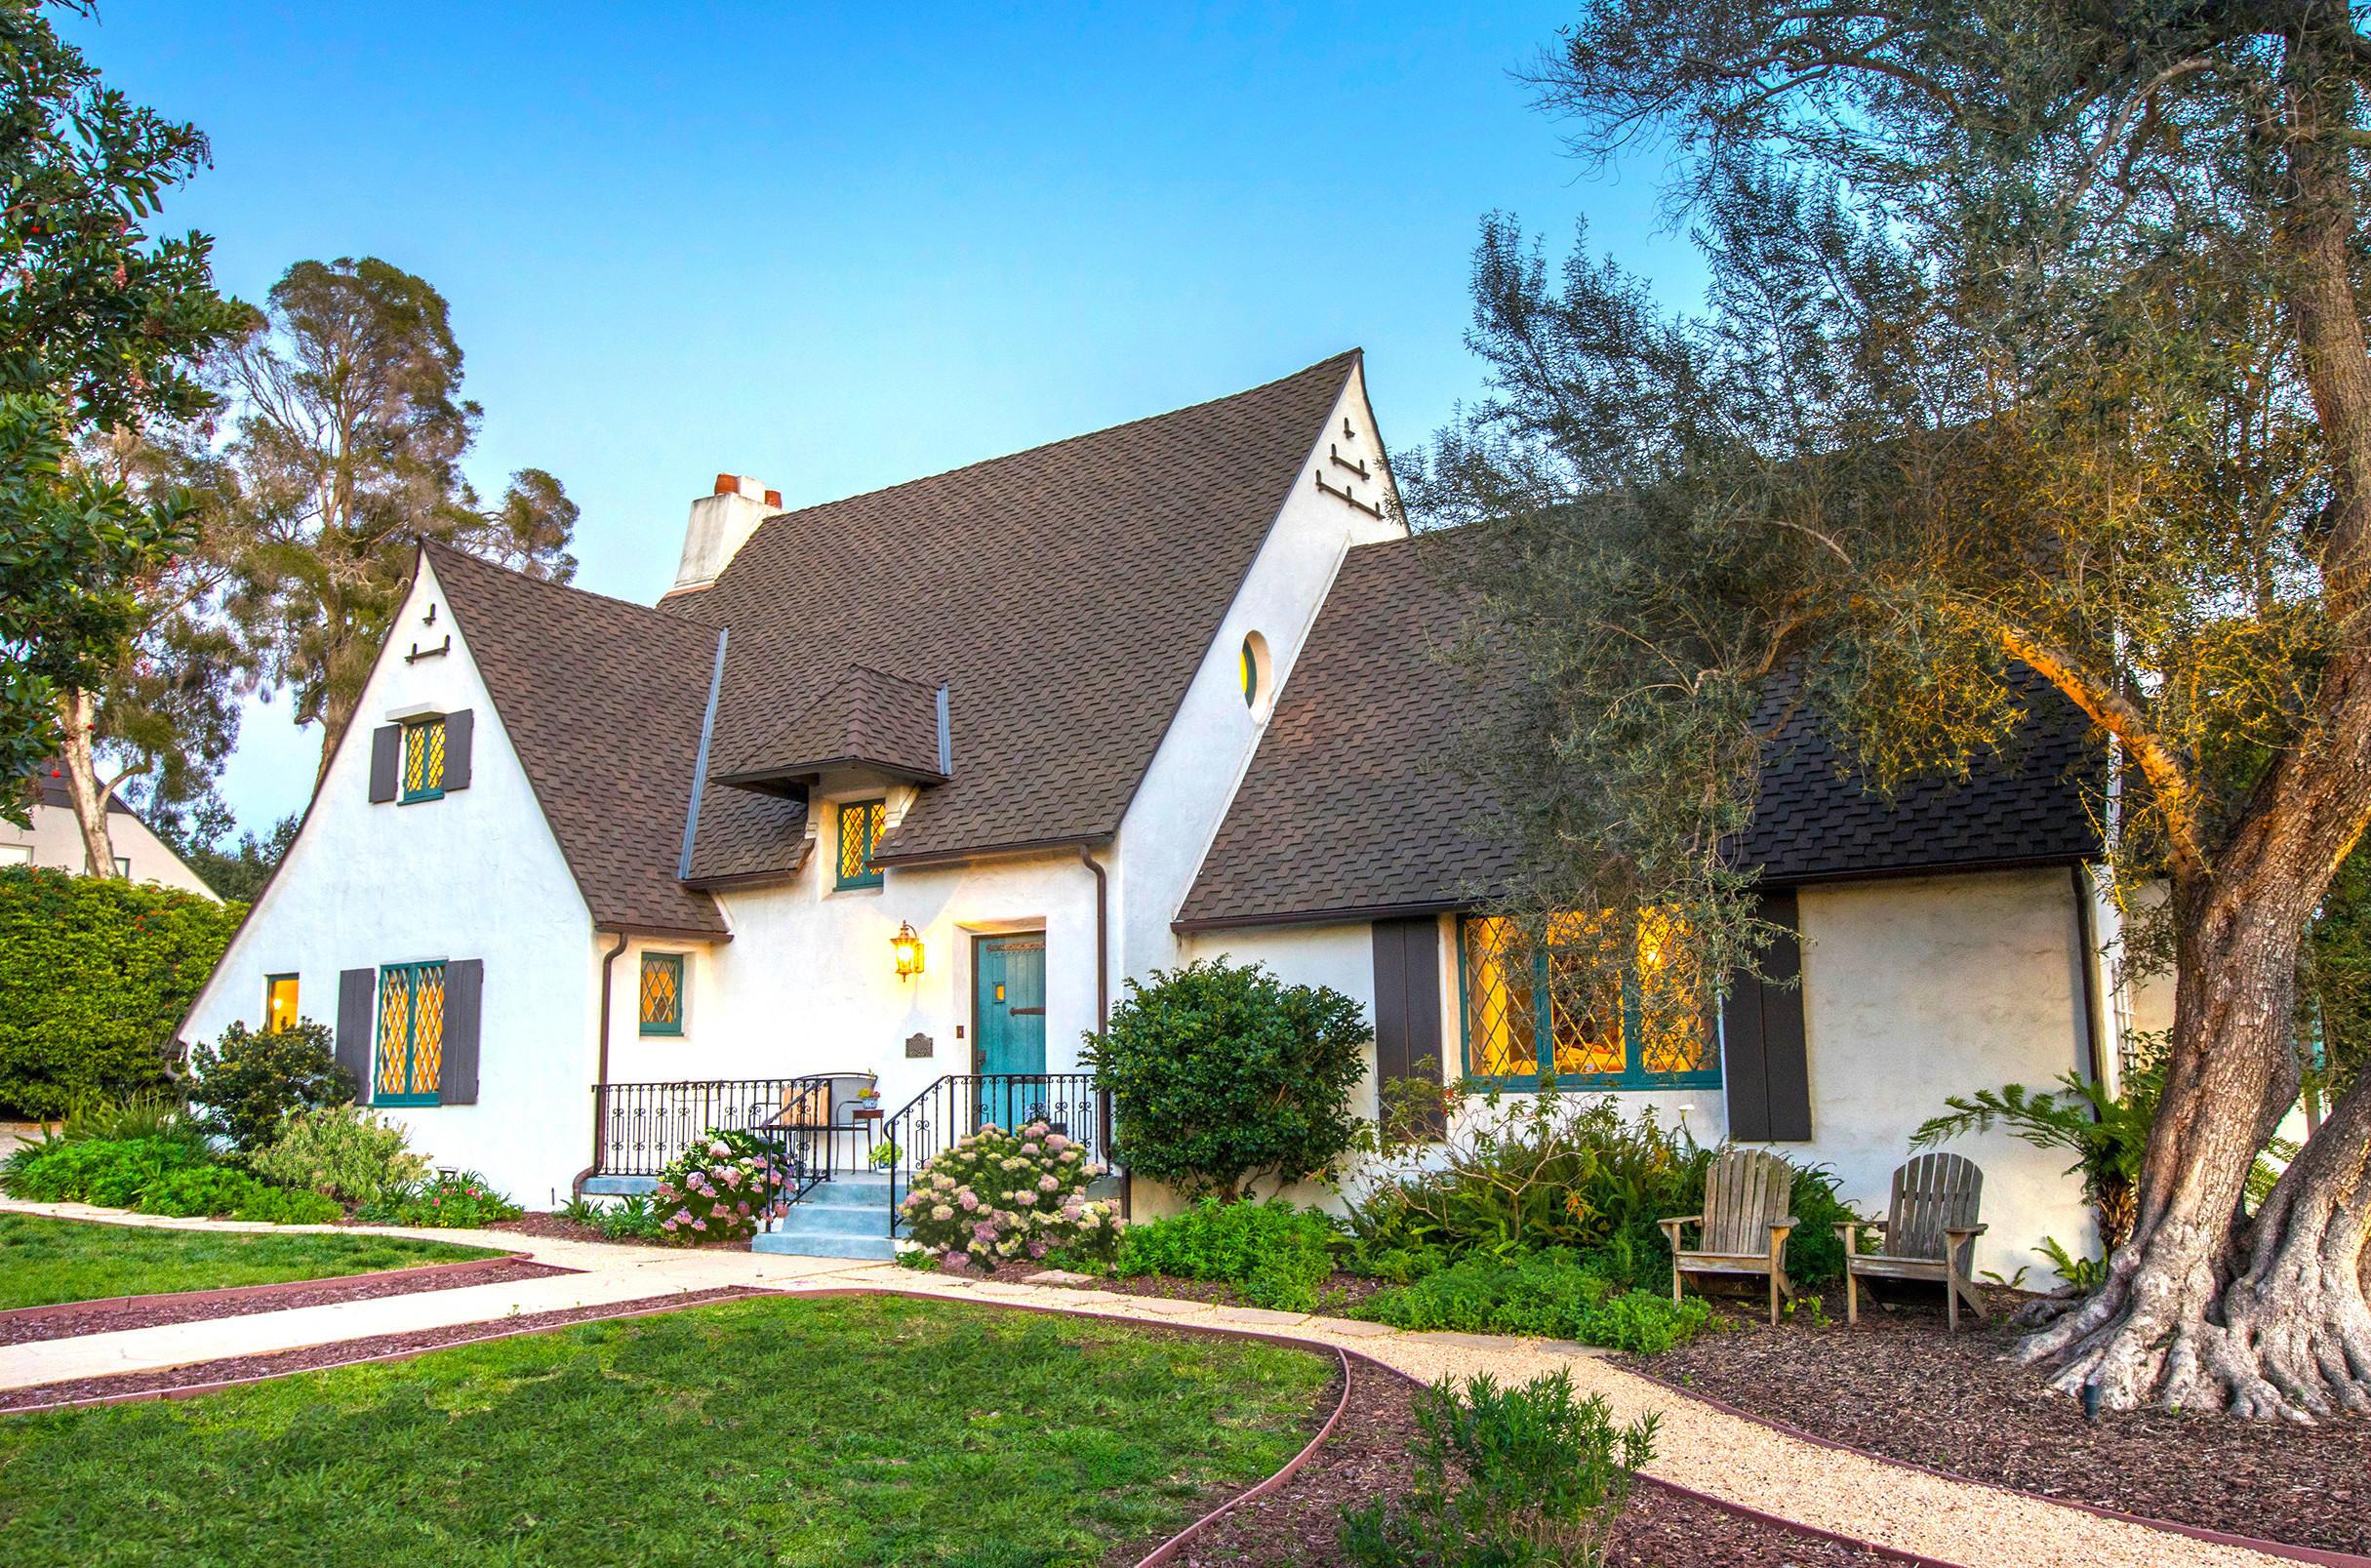 Property photo for 194 Canon Dr Santa Barbara, California 93105 - 17-837